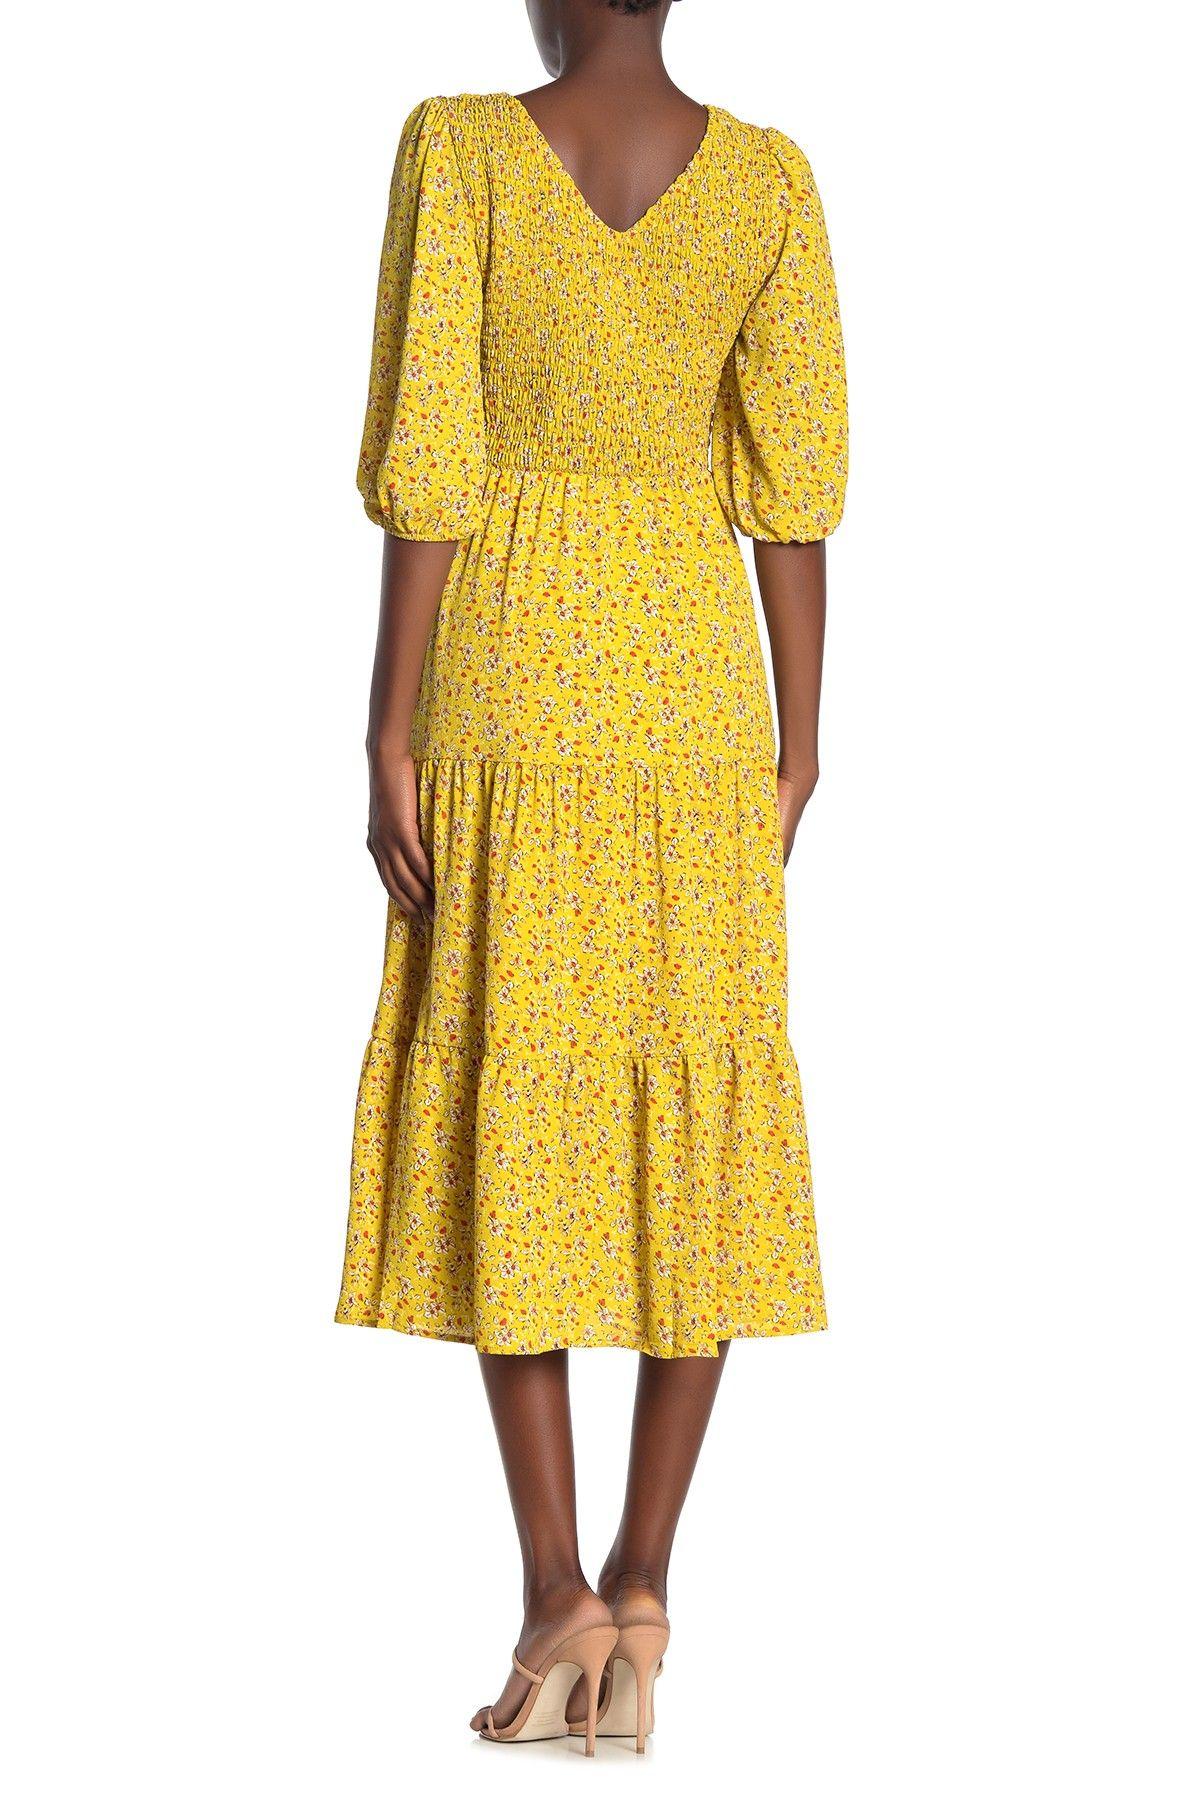 Superfoxx Smocked Bodice 3 4 Sleeve Midi Dress Nordstrom Rack Midi Dress With Sleeves Nordstrom Dresses Midi Dress [ 1800 x 1200 Pixel ]